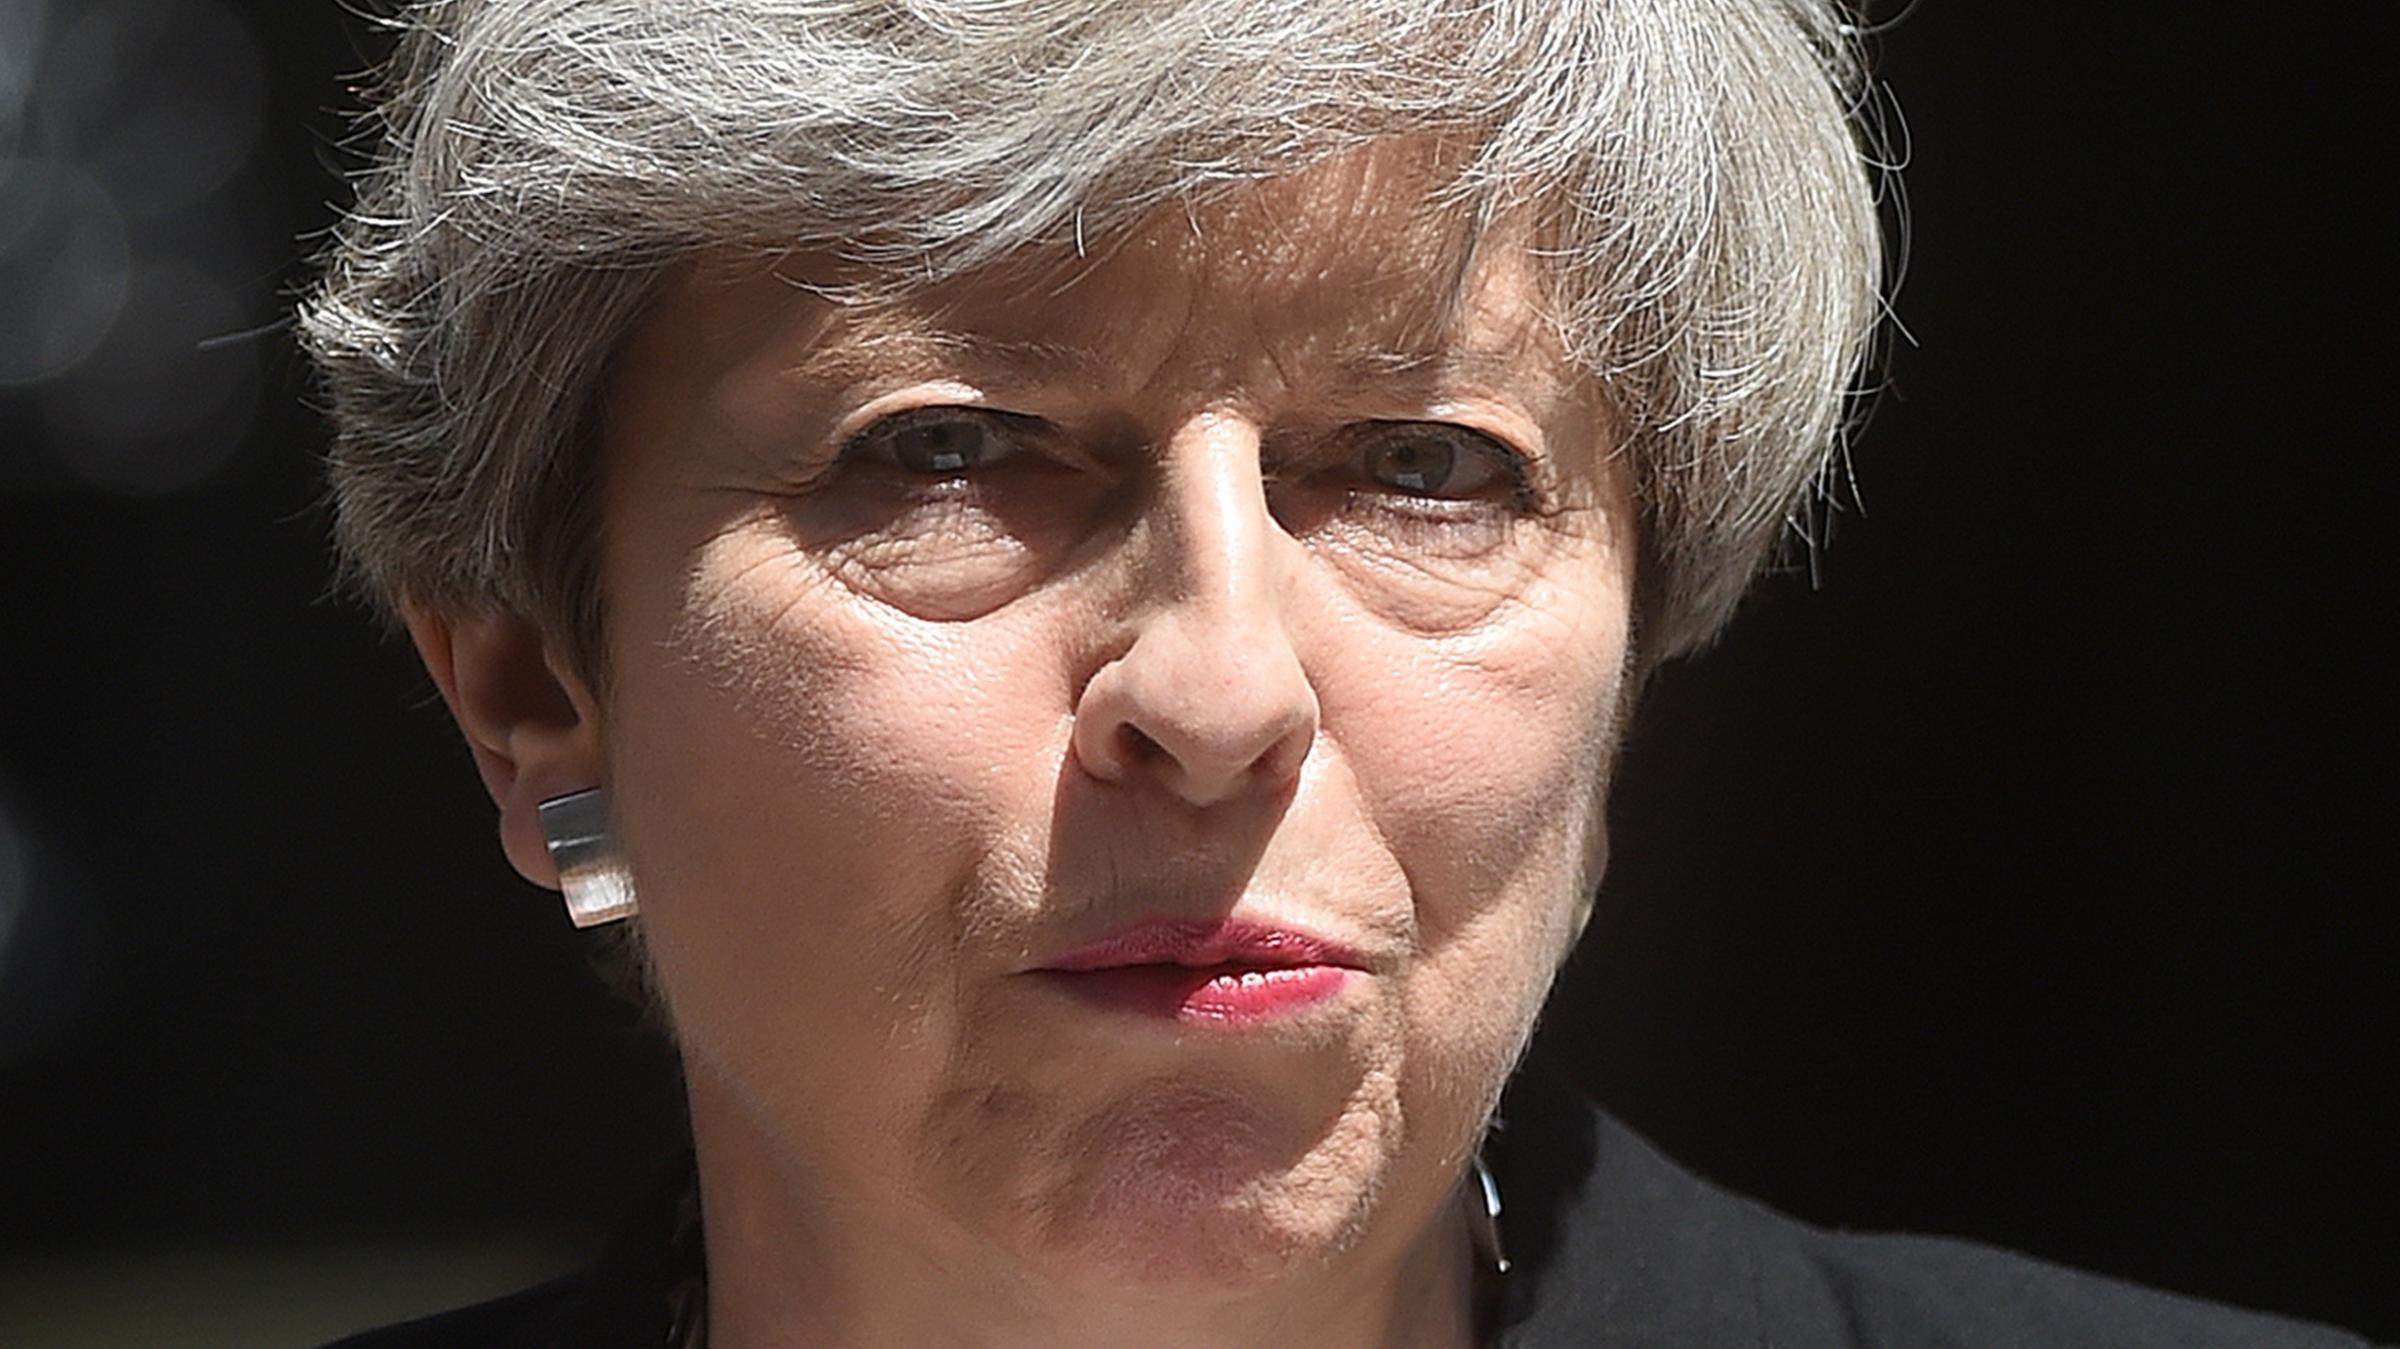 Theresa May 'reassures' Irish PM on DUP deal